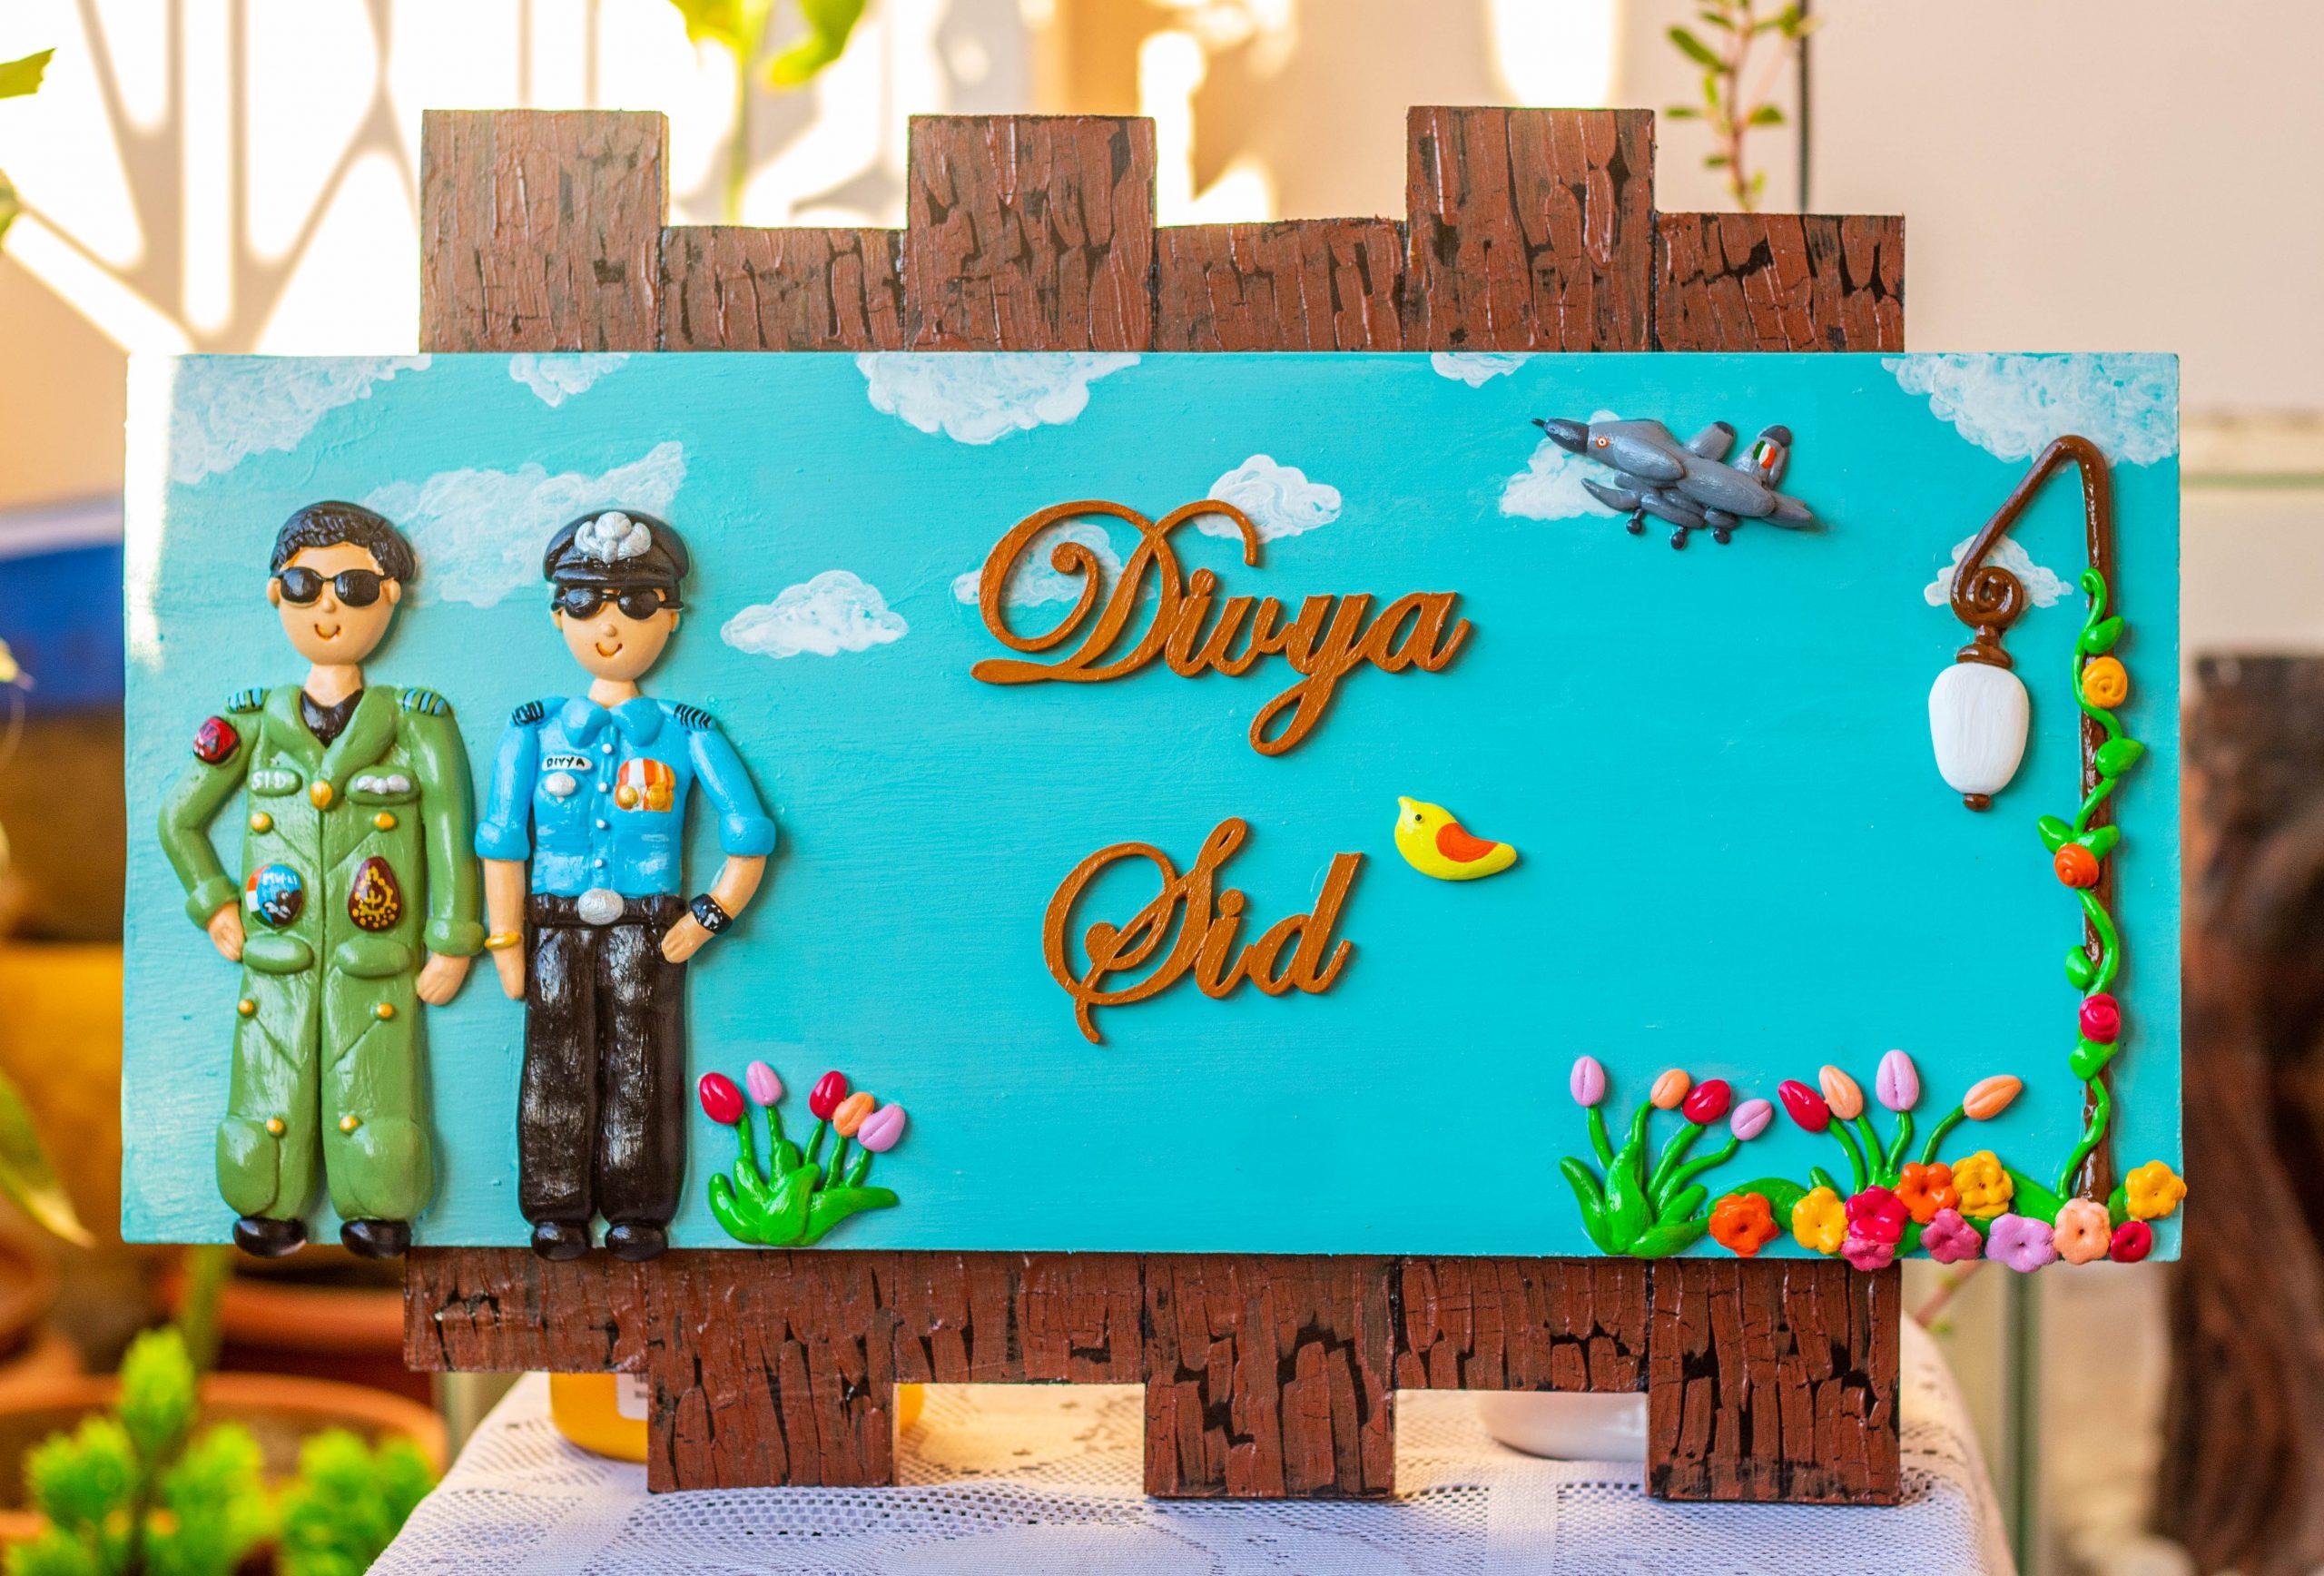 Buy best handmade online name plate designs for home